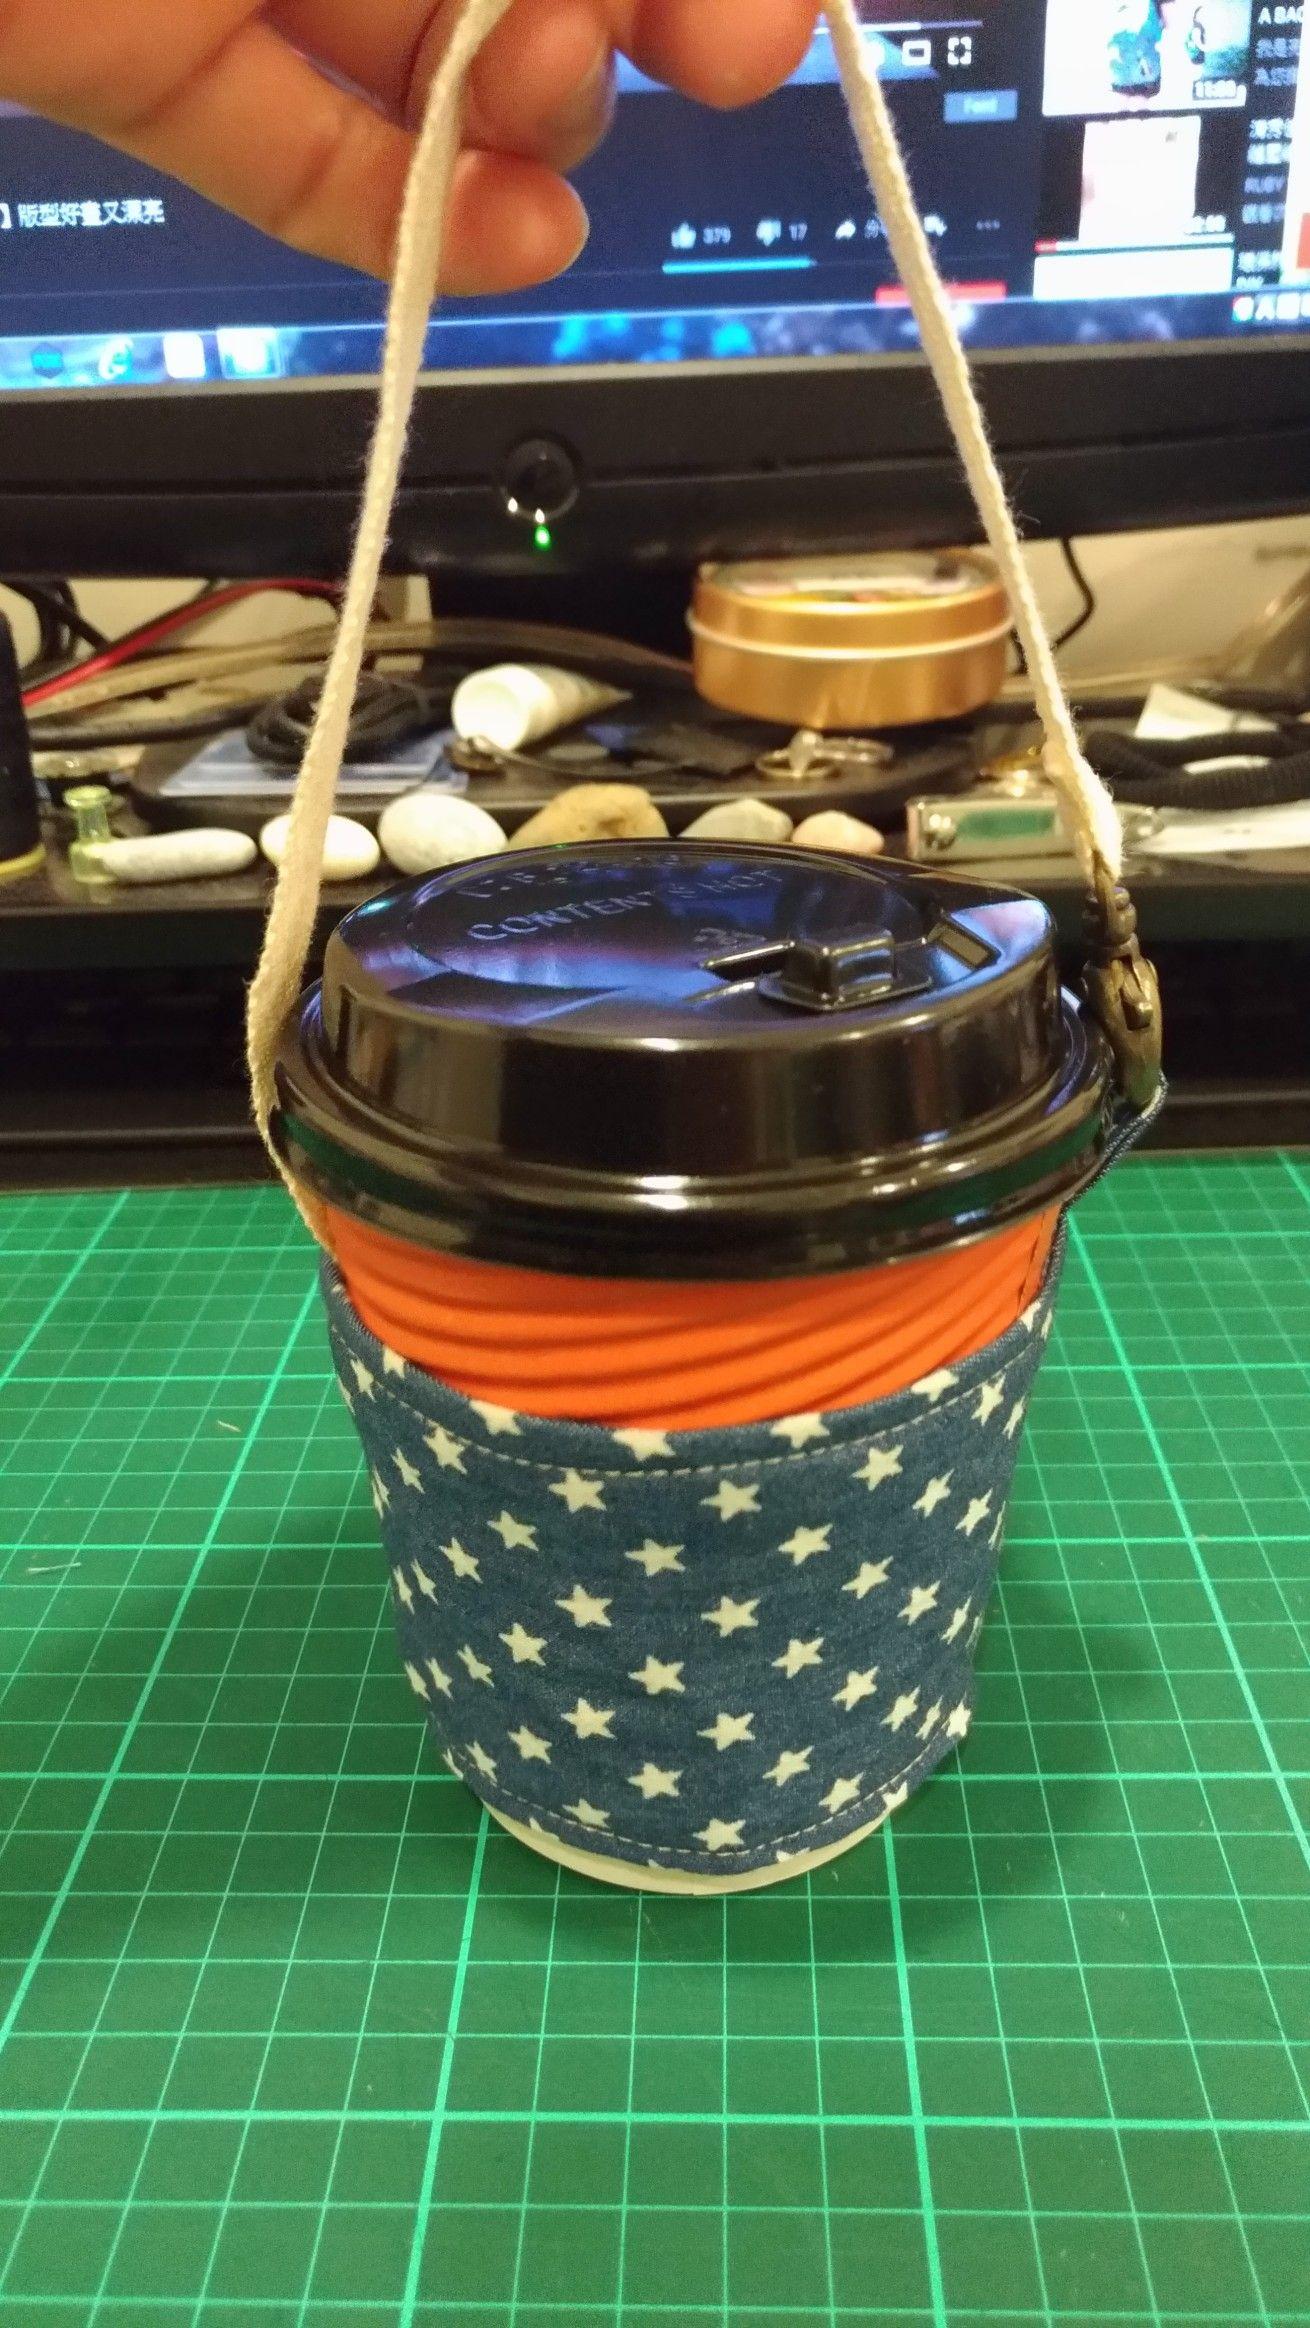 Pin by yeye on Handmade | Compost bin, Handmade, Compost